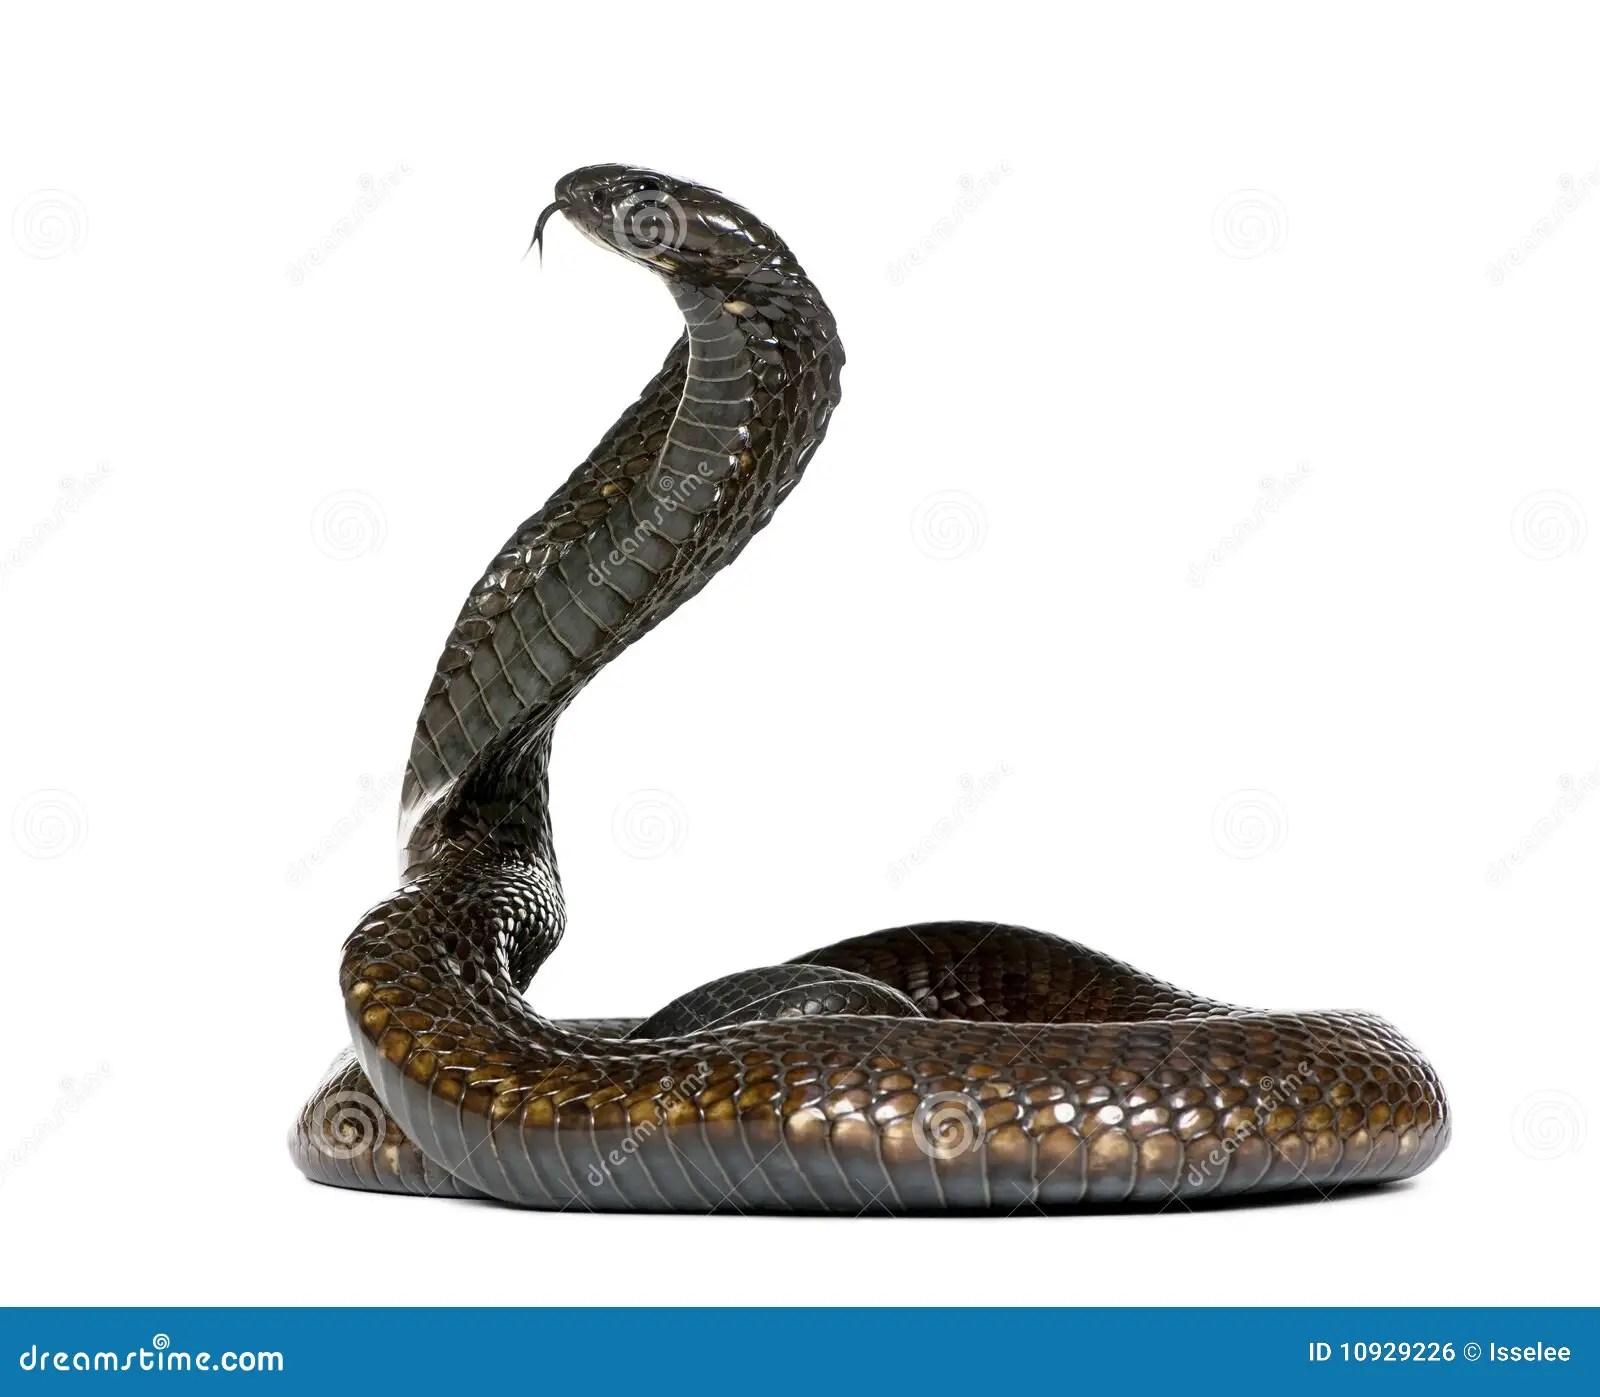 3d Animated Snake Live Wallpaper Cobra Egipcia Delante De Un Fondo Blanco Foto De Archivo